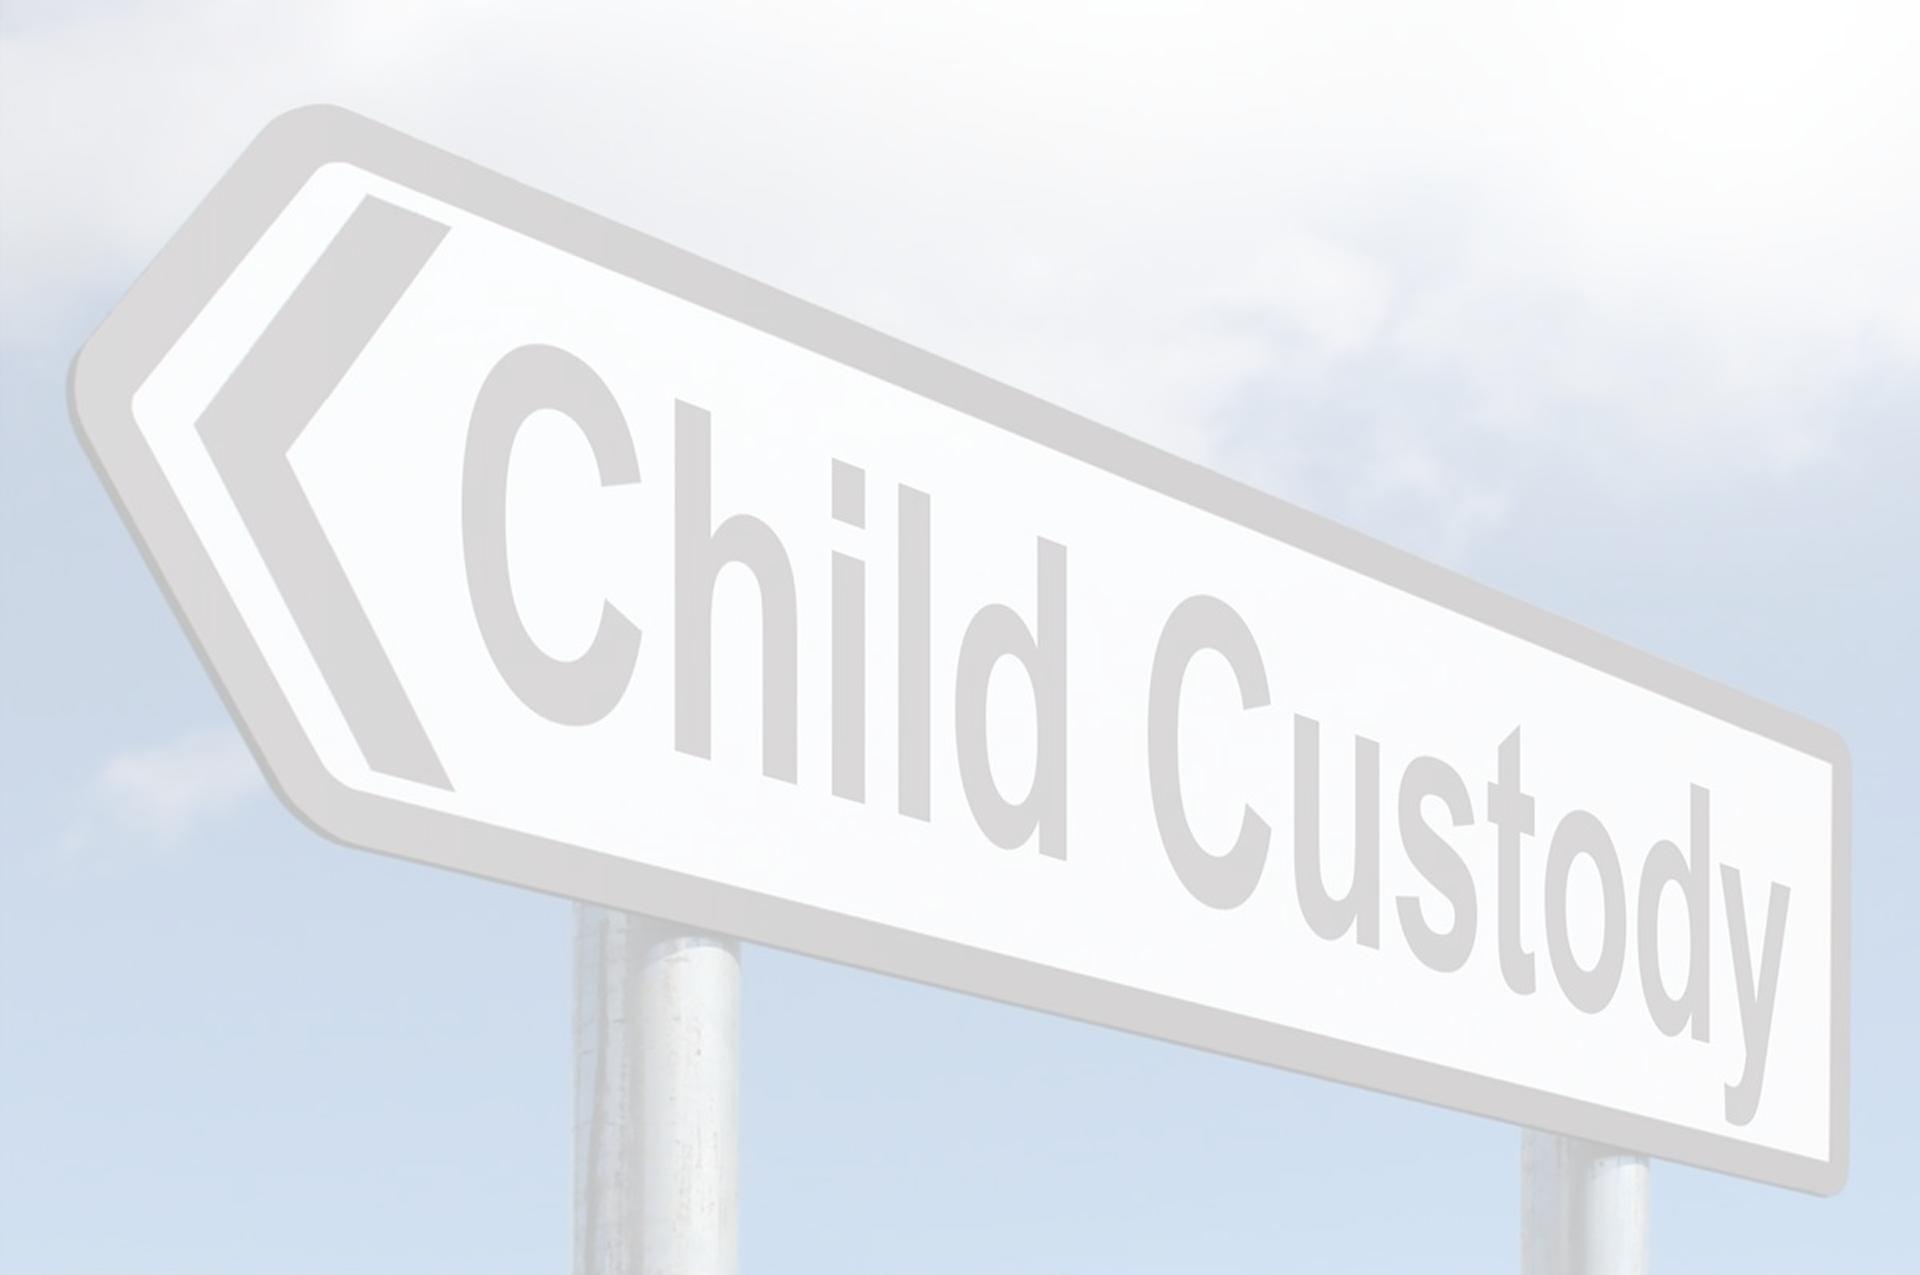 Child Custody - Your Rights & Responsibilities